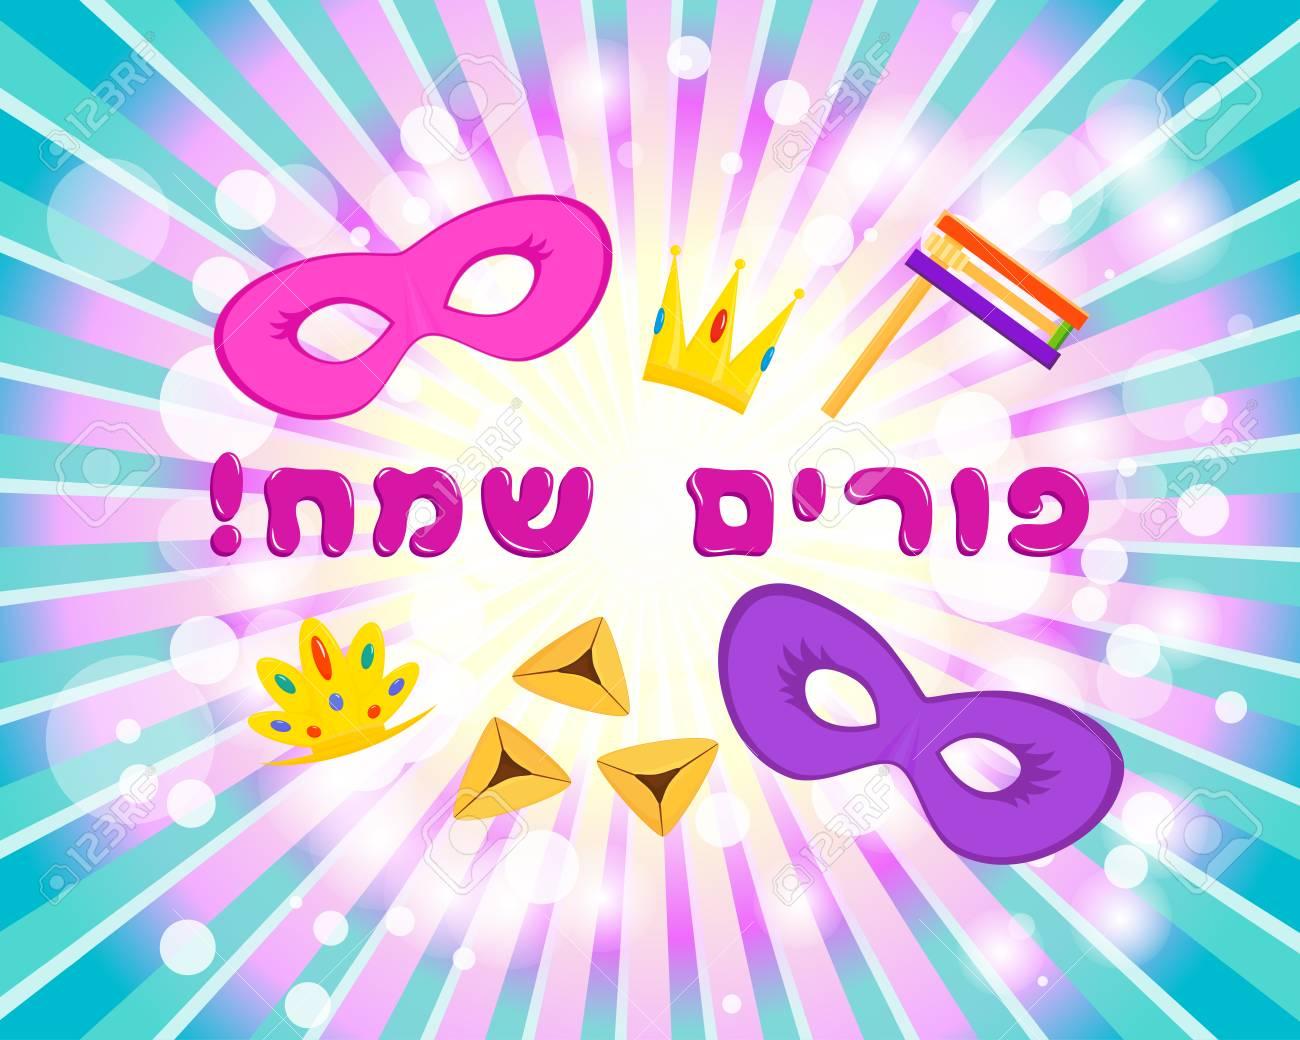 Jewish Holiday Of Purim Greeting Card With Holiday Symbols